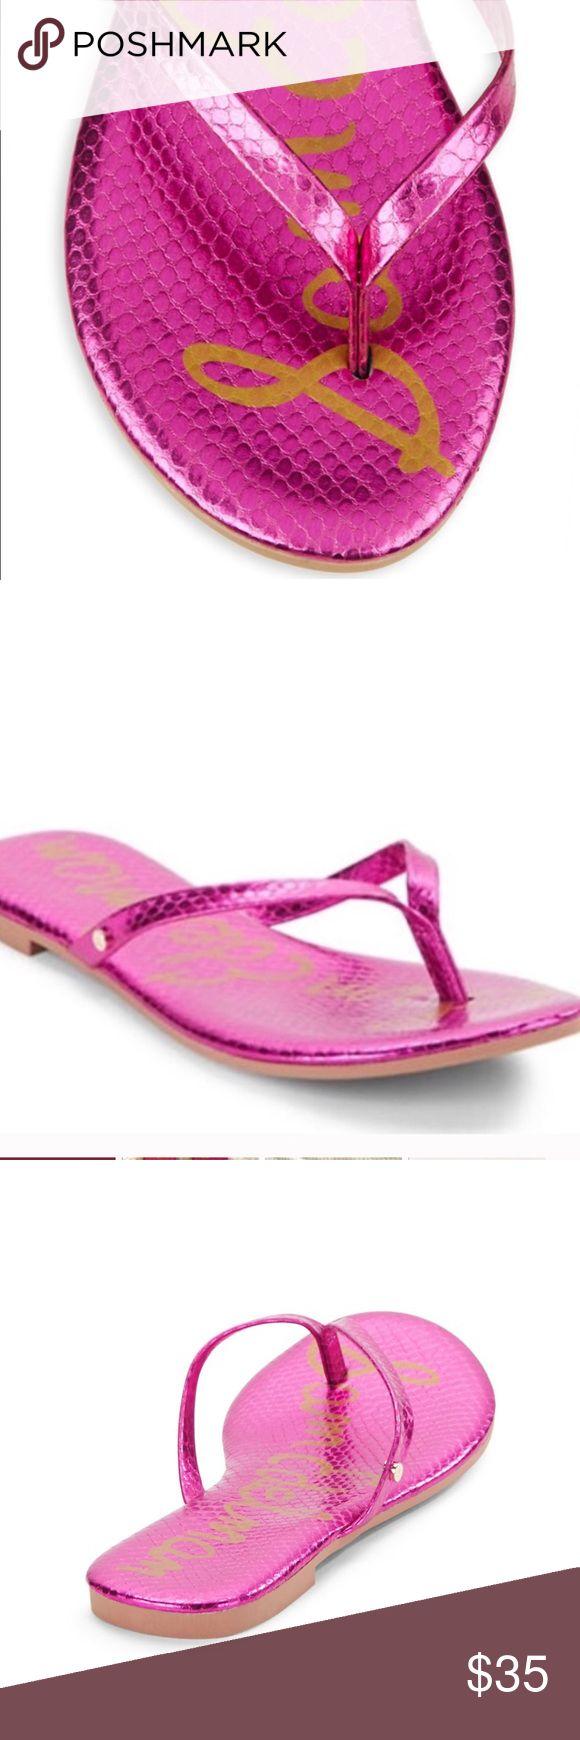 Sam Edelman Oliver Metallic Pink Flip Flops Sz 6 Brand new! Super cute flip flops Sam Edelman Shoes Sandals